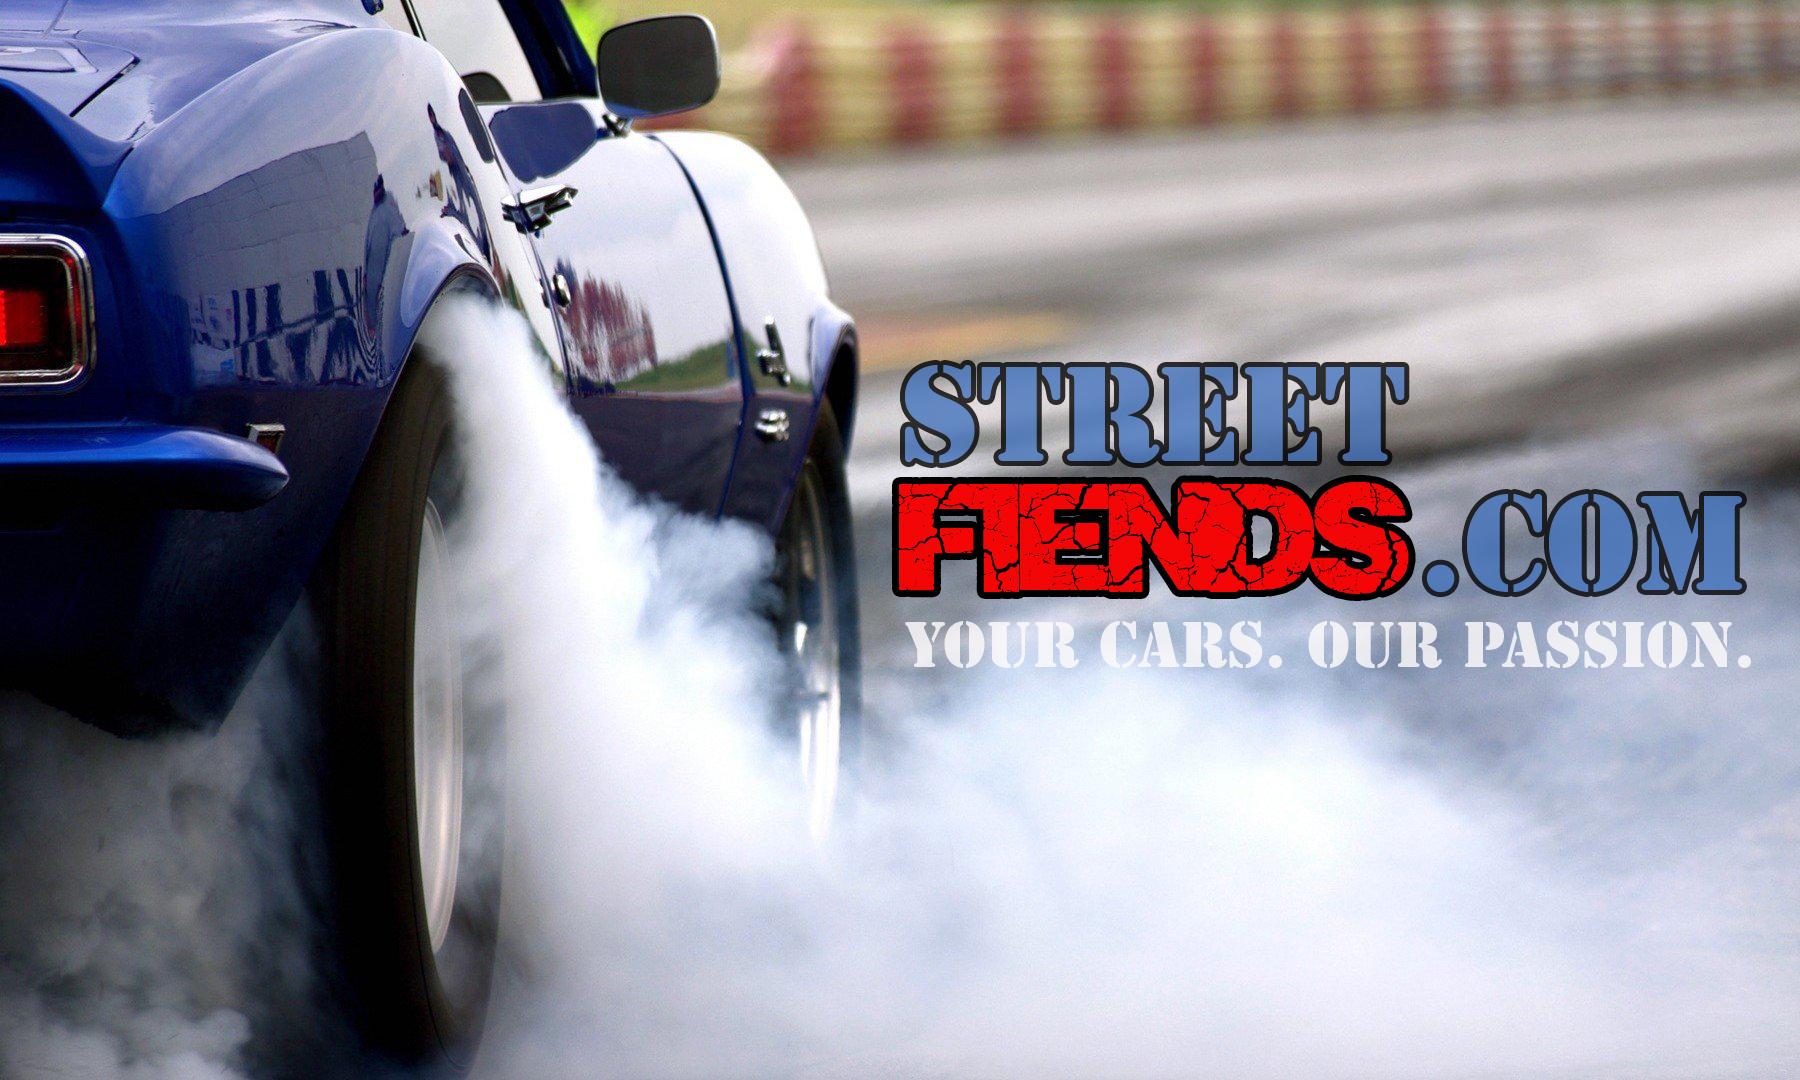 StreetFiends.com